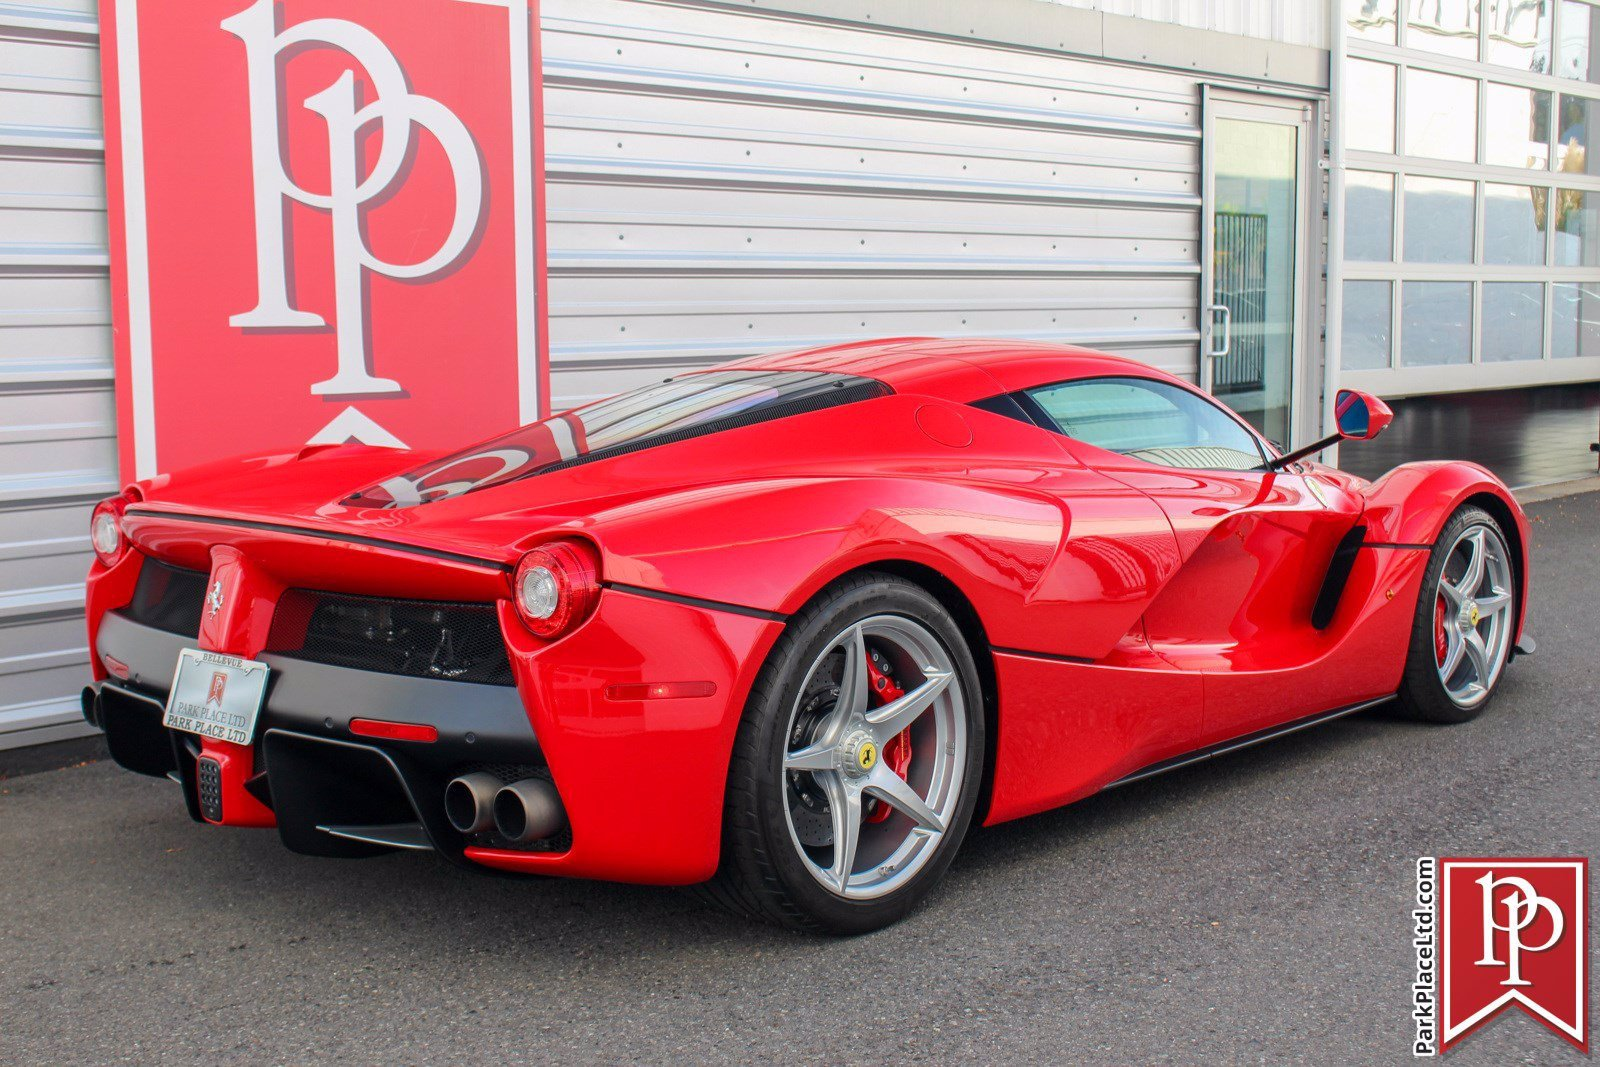 2014_Ferrari_LaFerrari_sale-0004